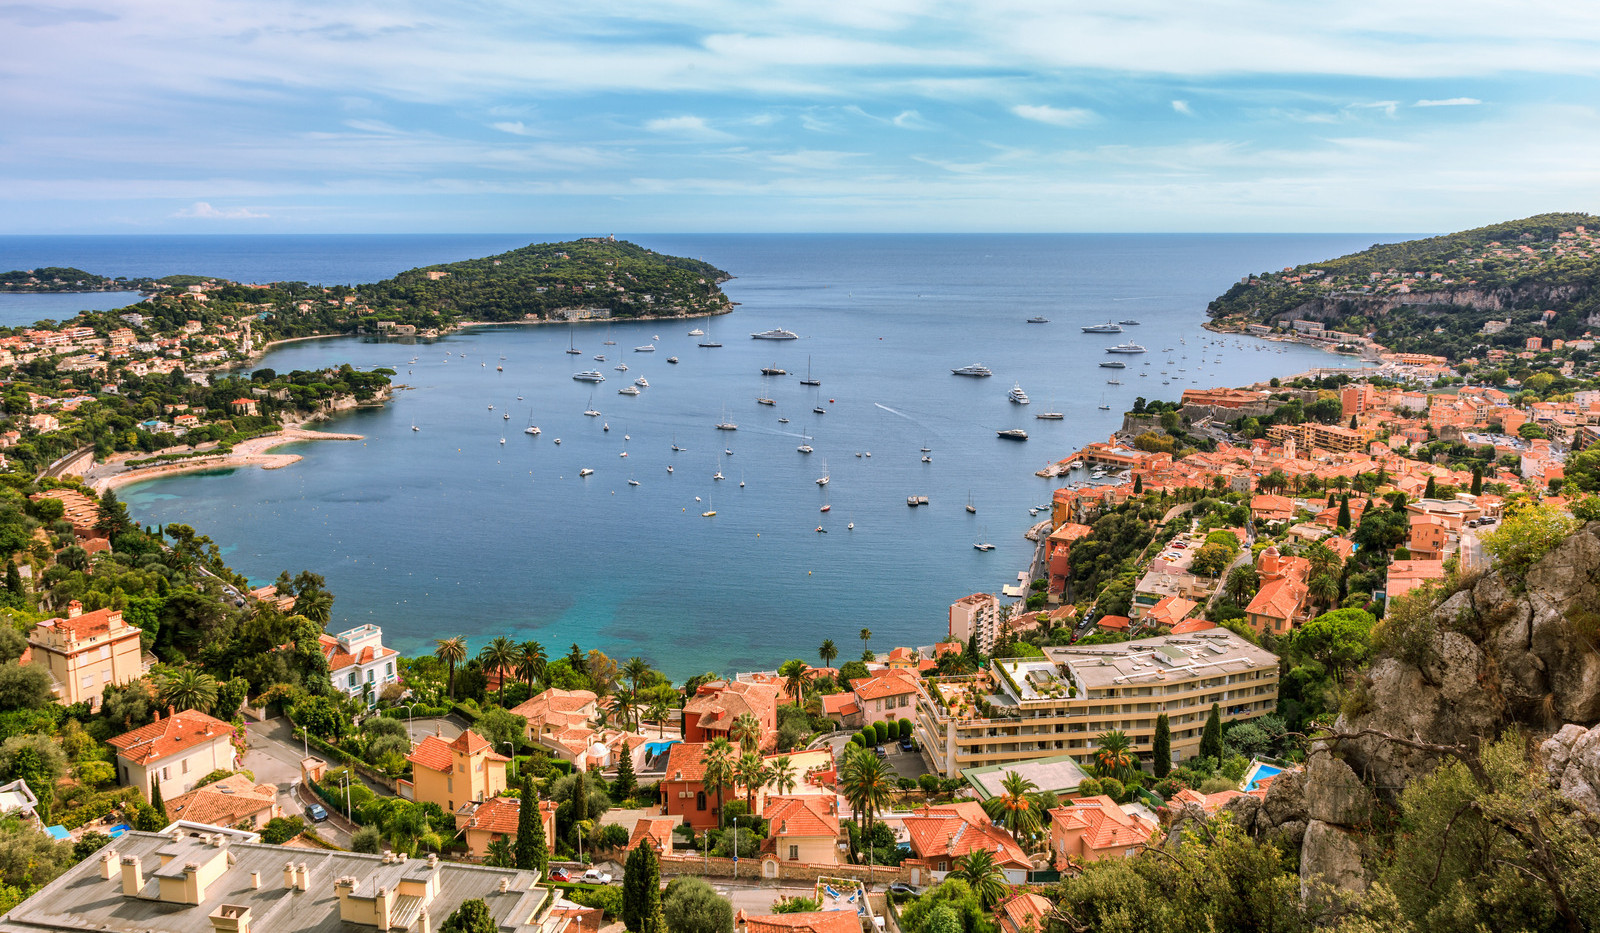 Canva - Cote d'Azur by Nice, France.jpg